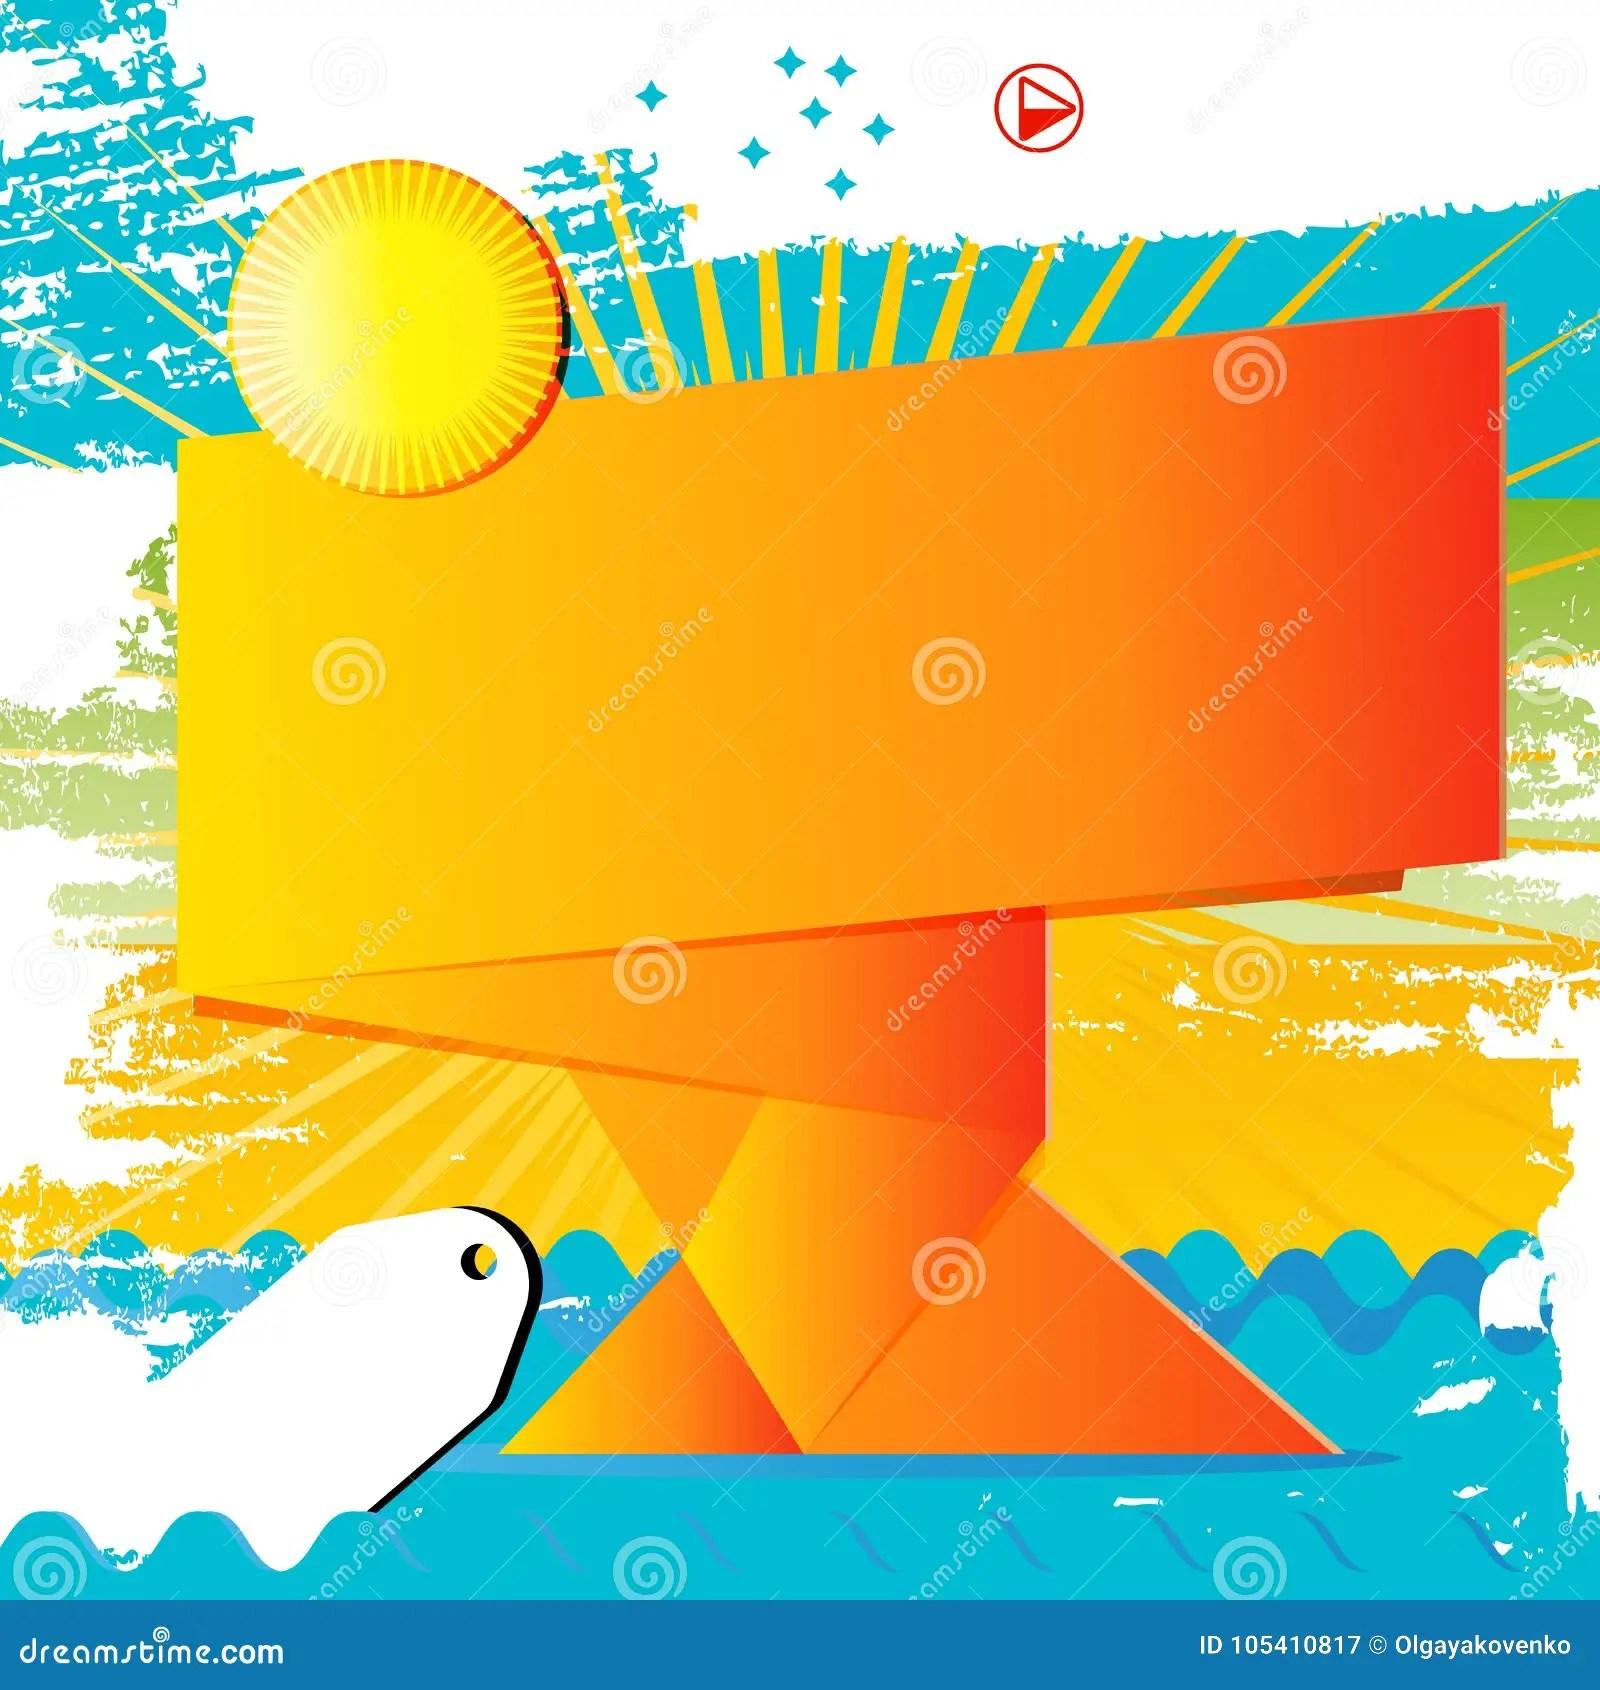 https www dreamstime com poster sale design template orange banner background sun vector whit colors offer print promotion discount illustration place image105410817